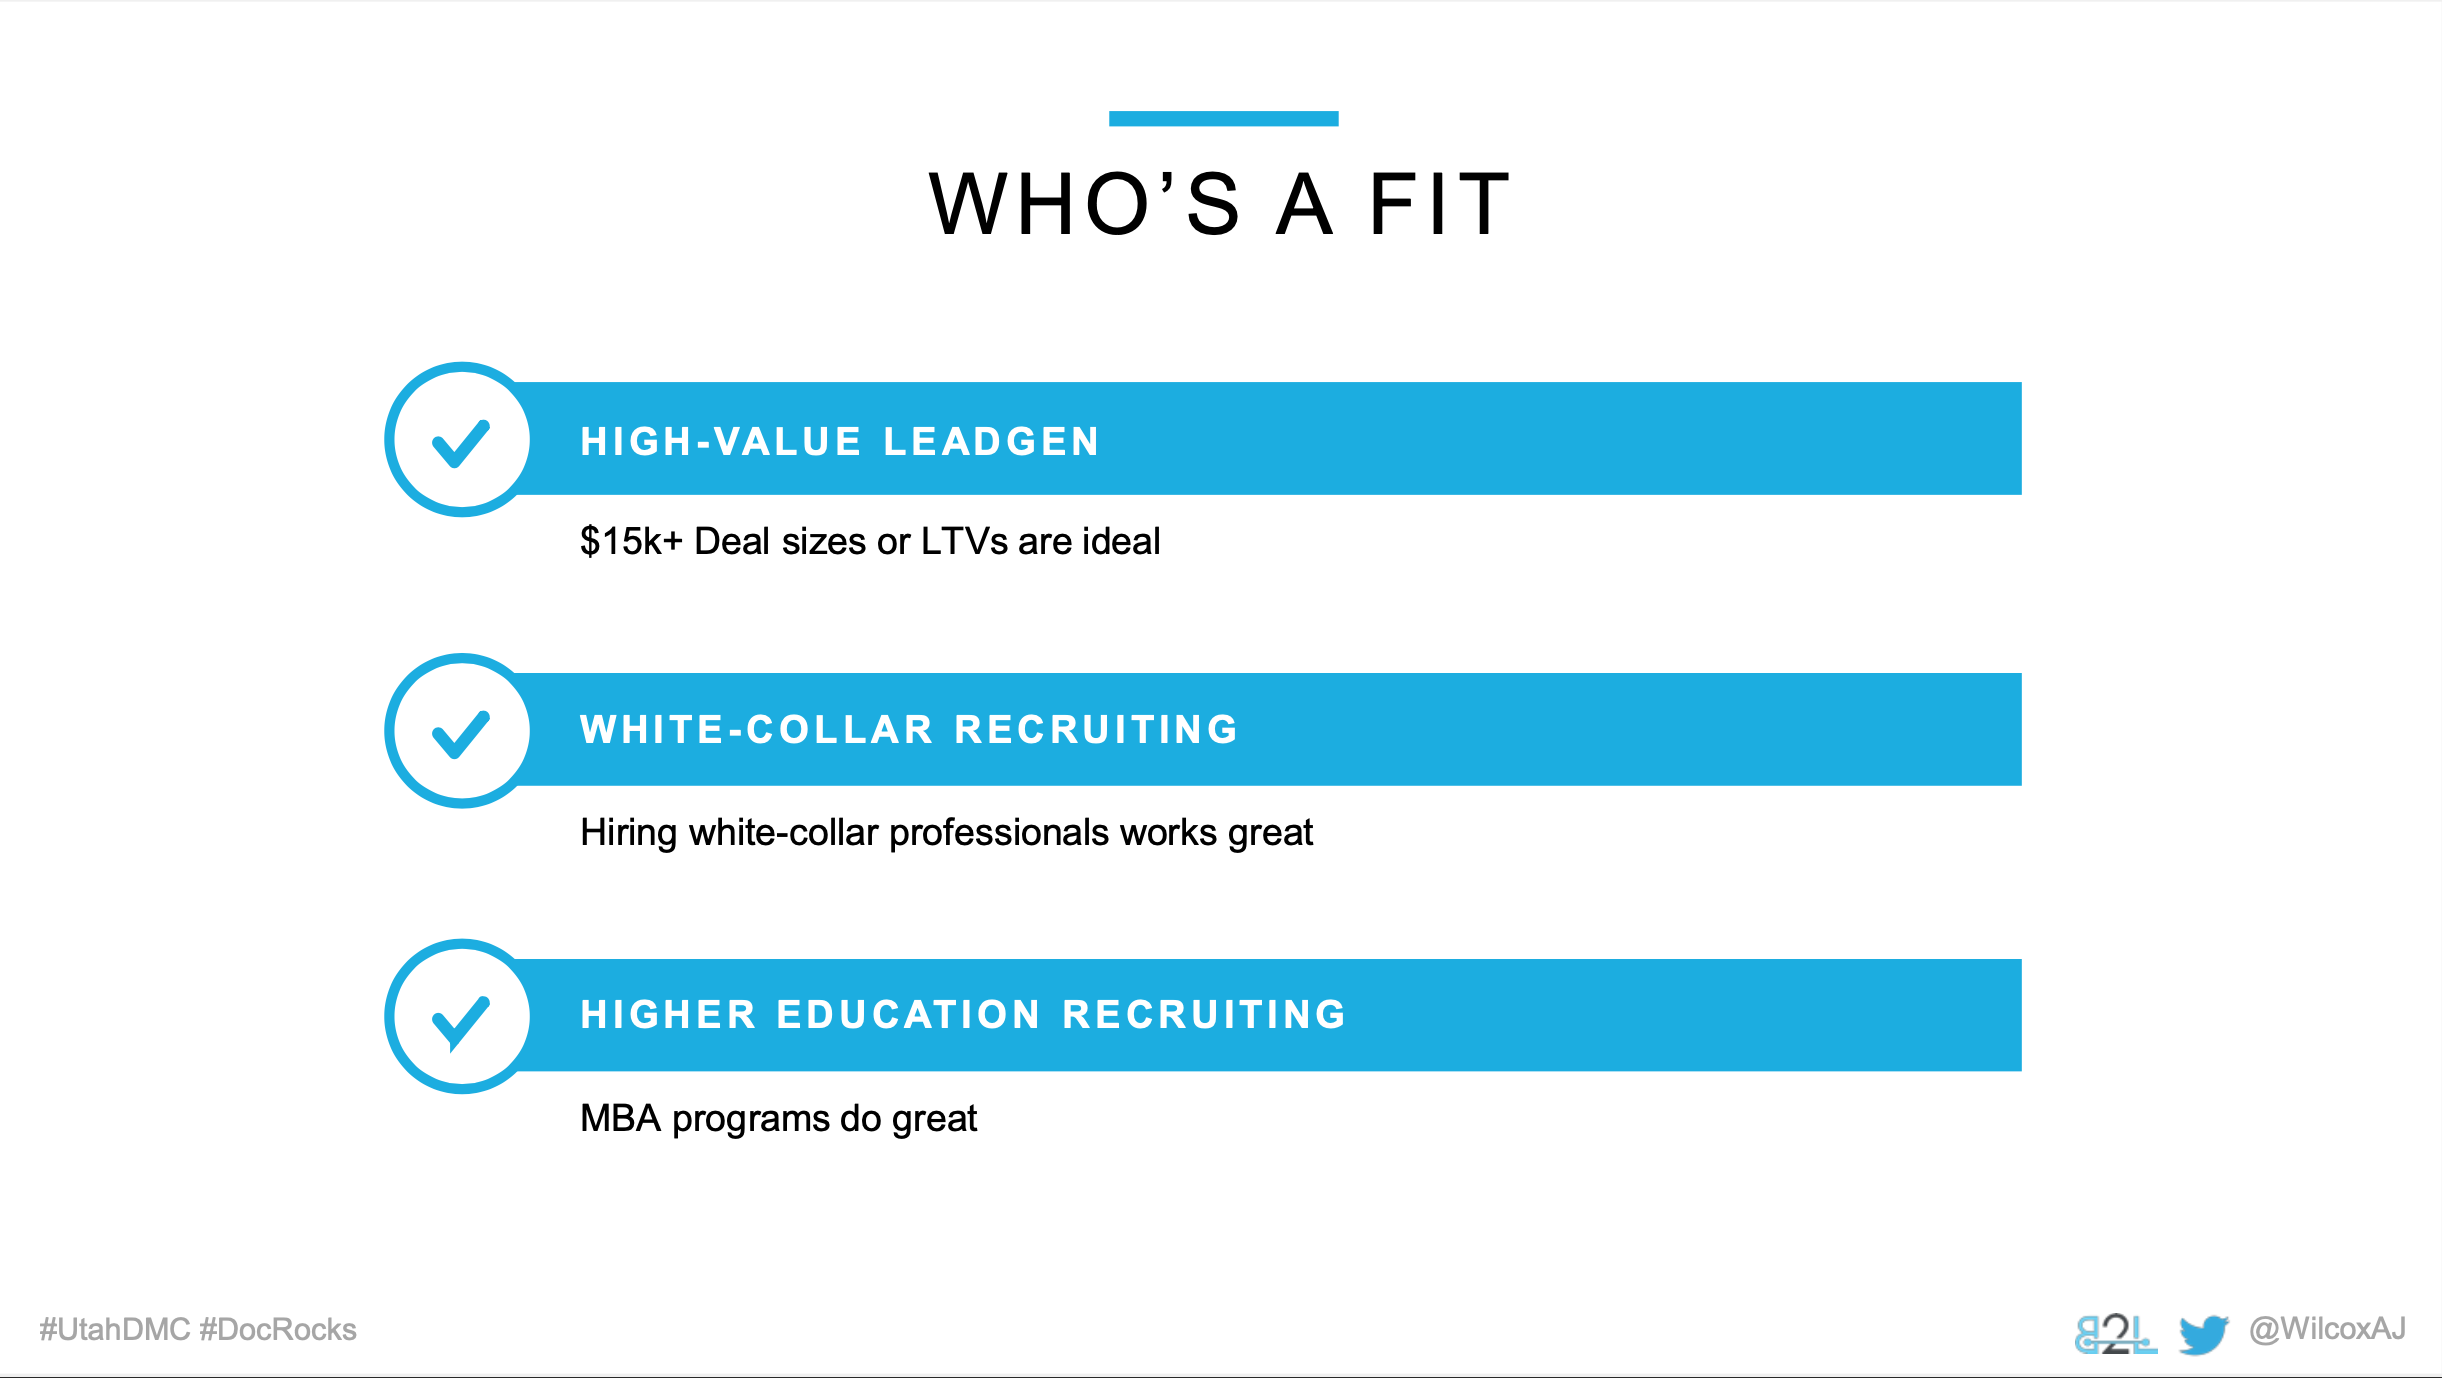 Utah DMC LinkedIn Ads - AJ \Wilcox - Whos a fit